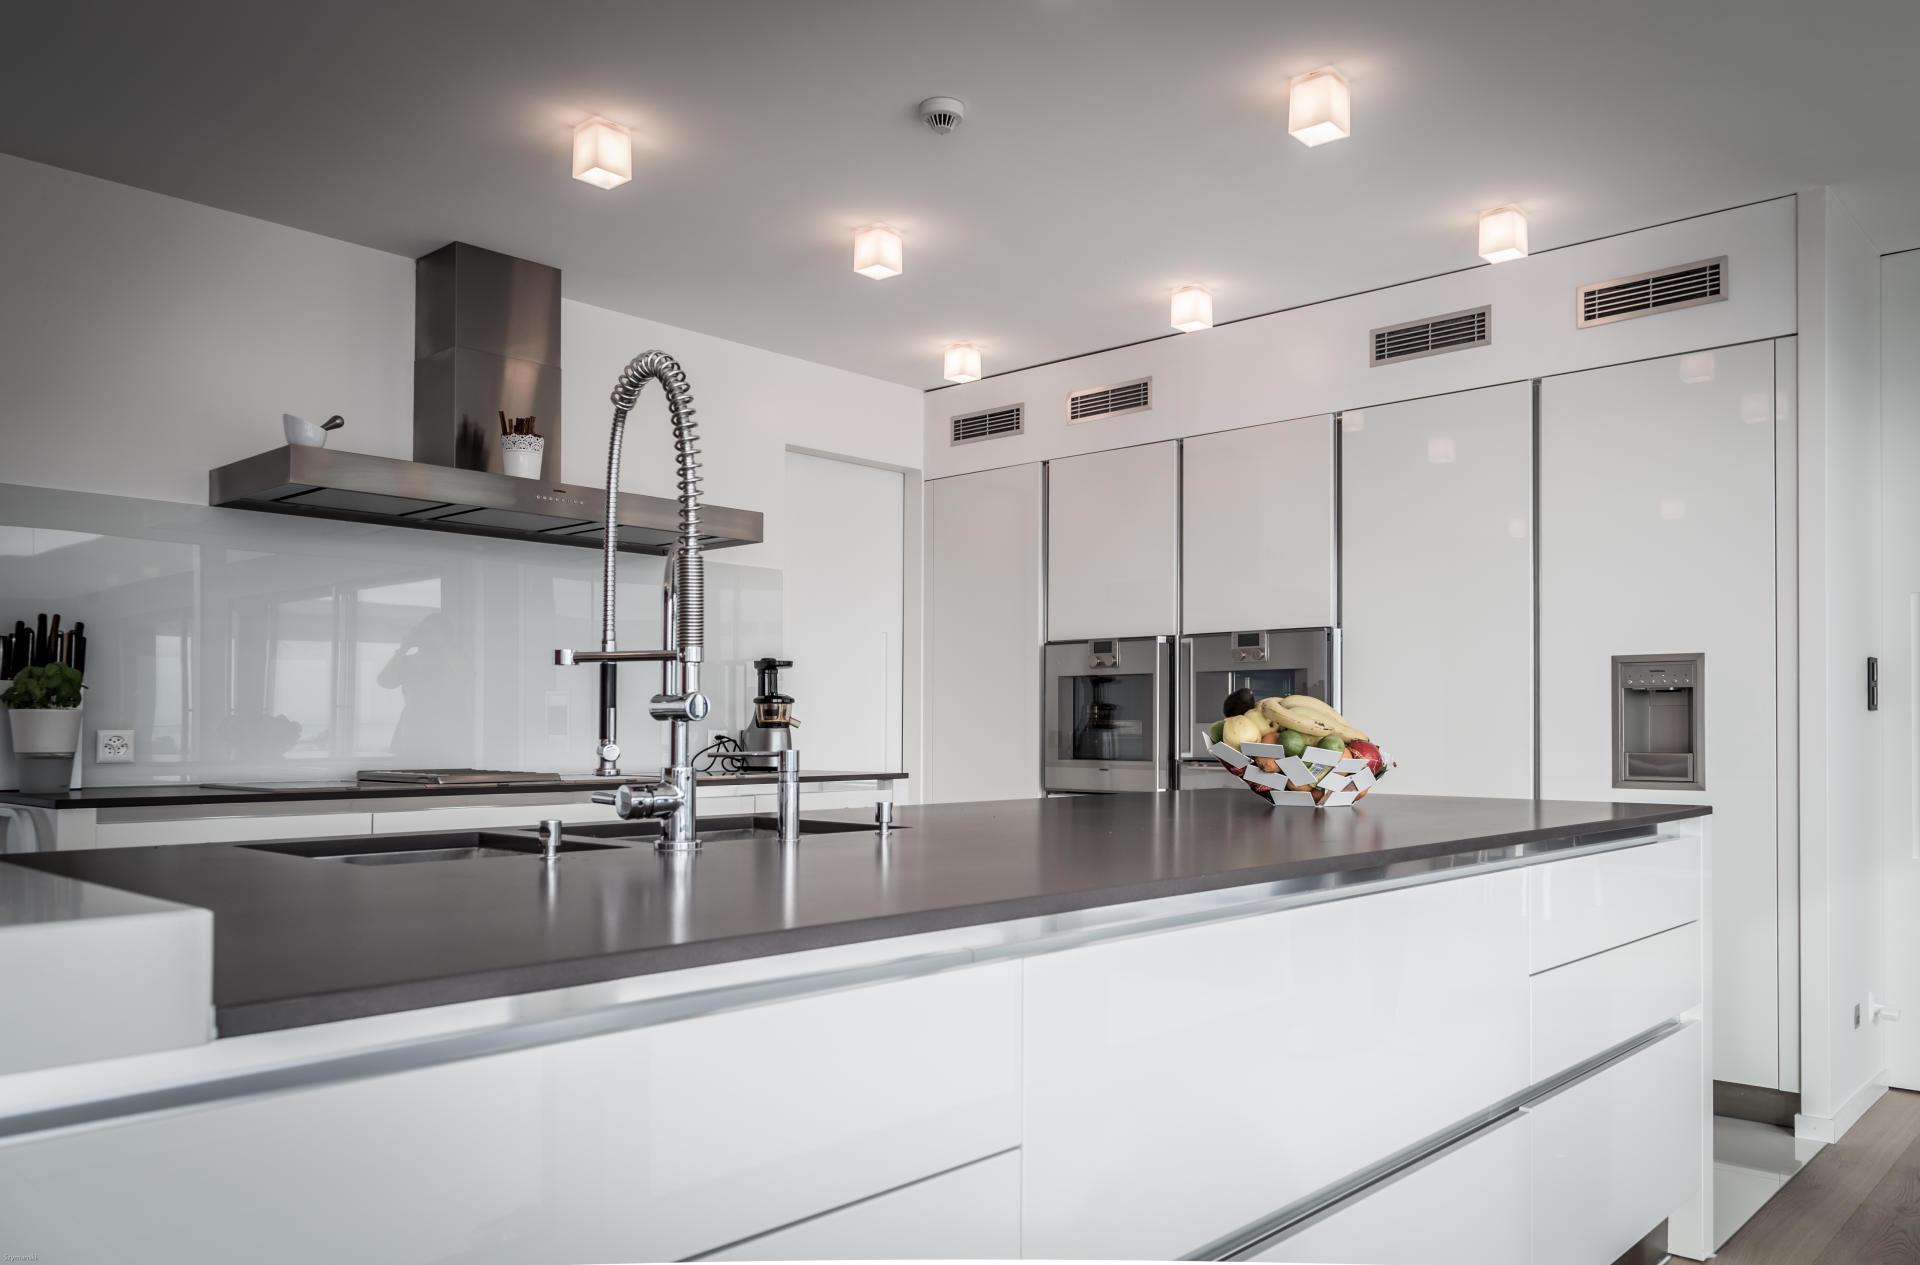 The Kitchen Diner Living Area Extension Plans Tammymum